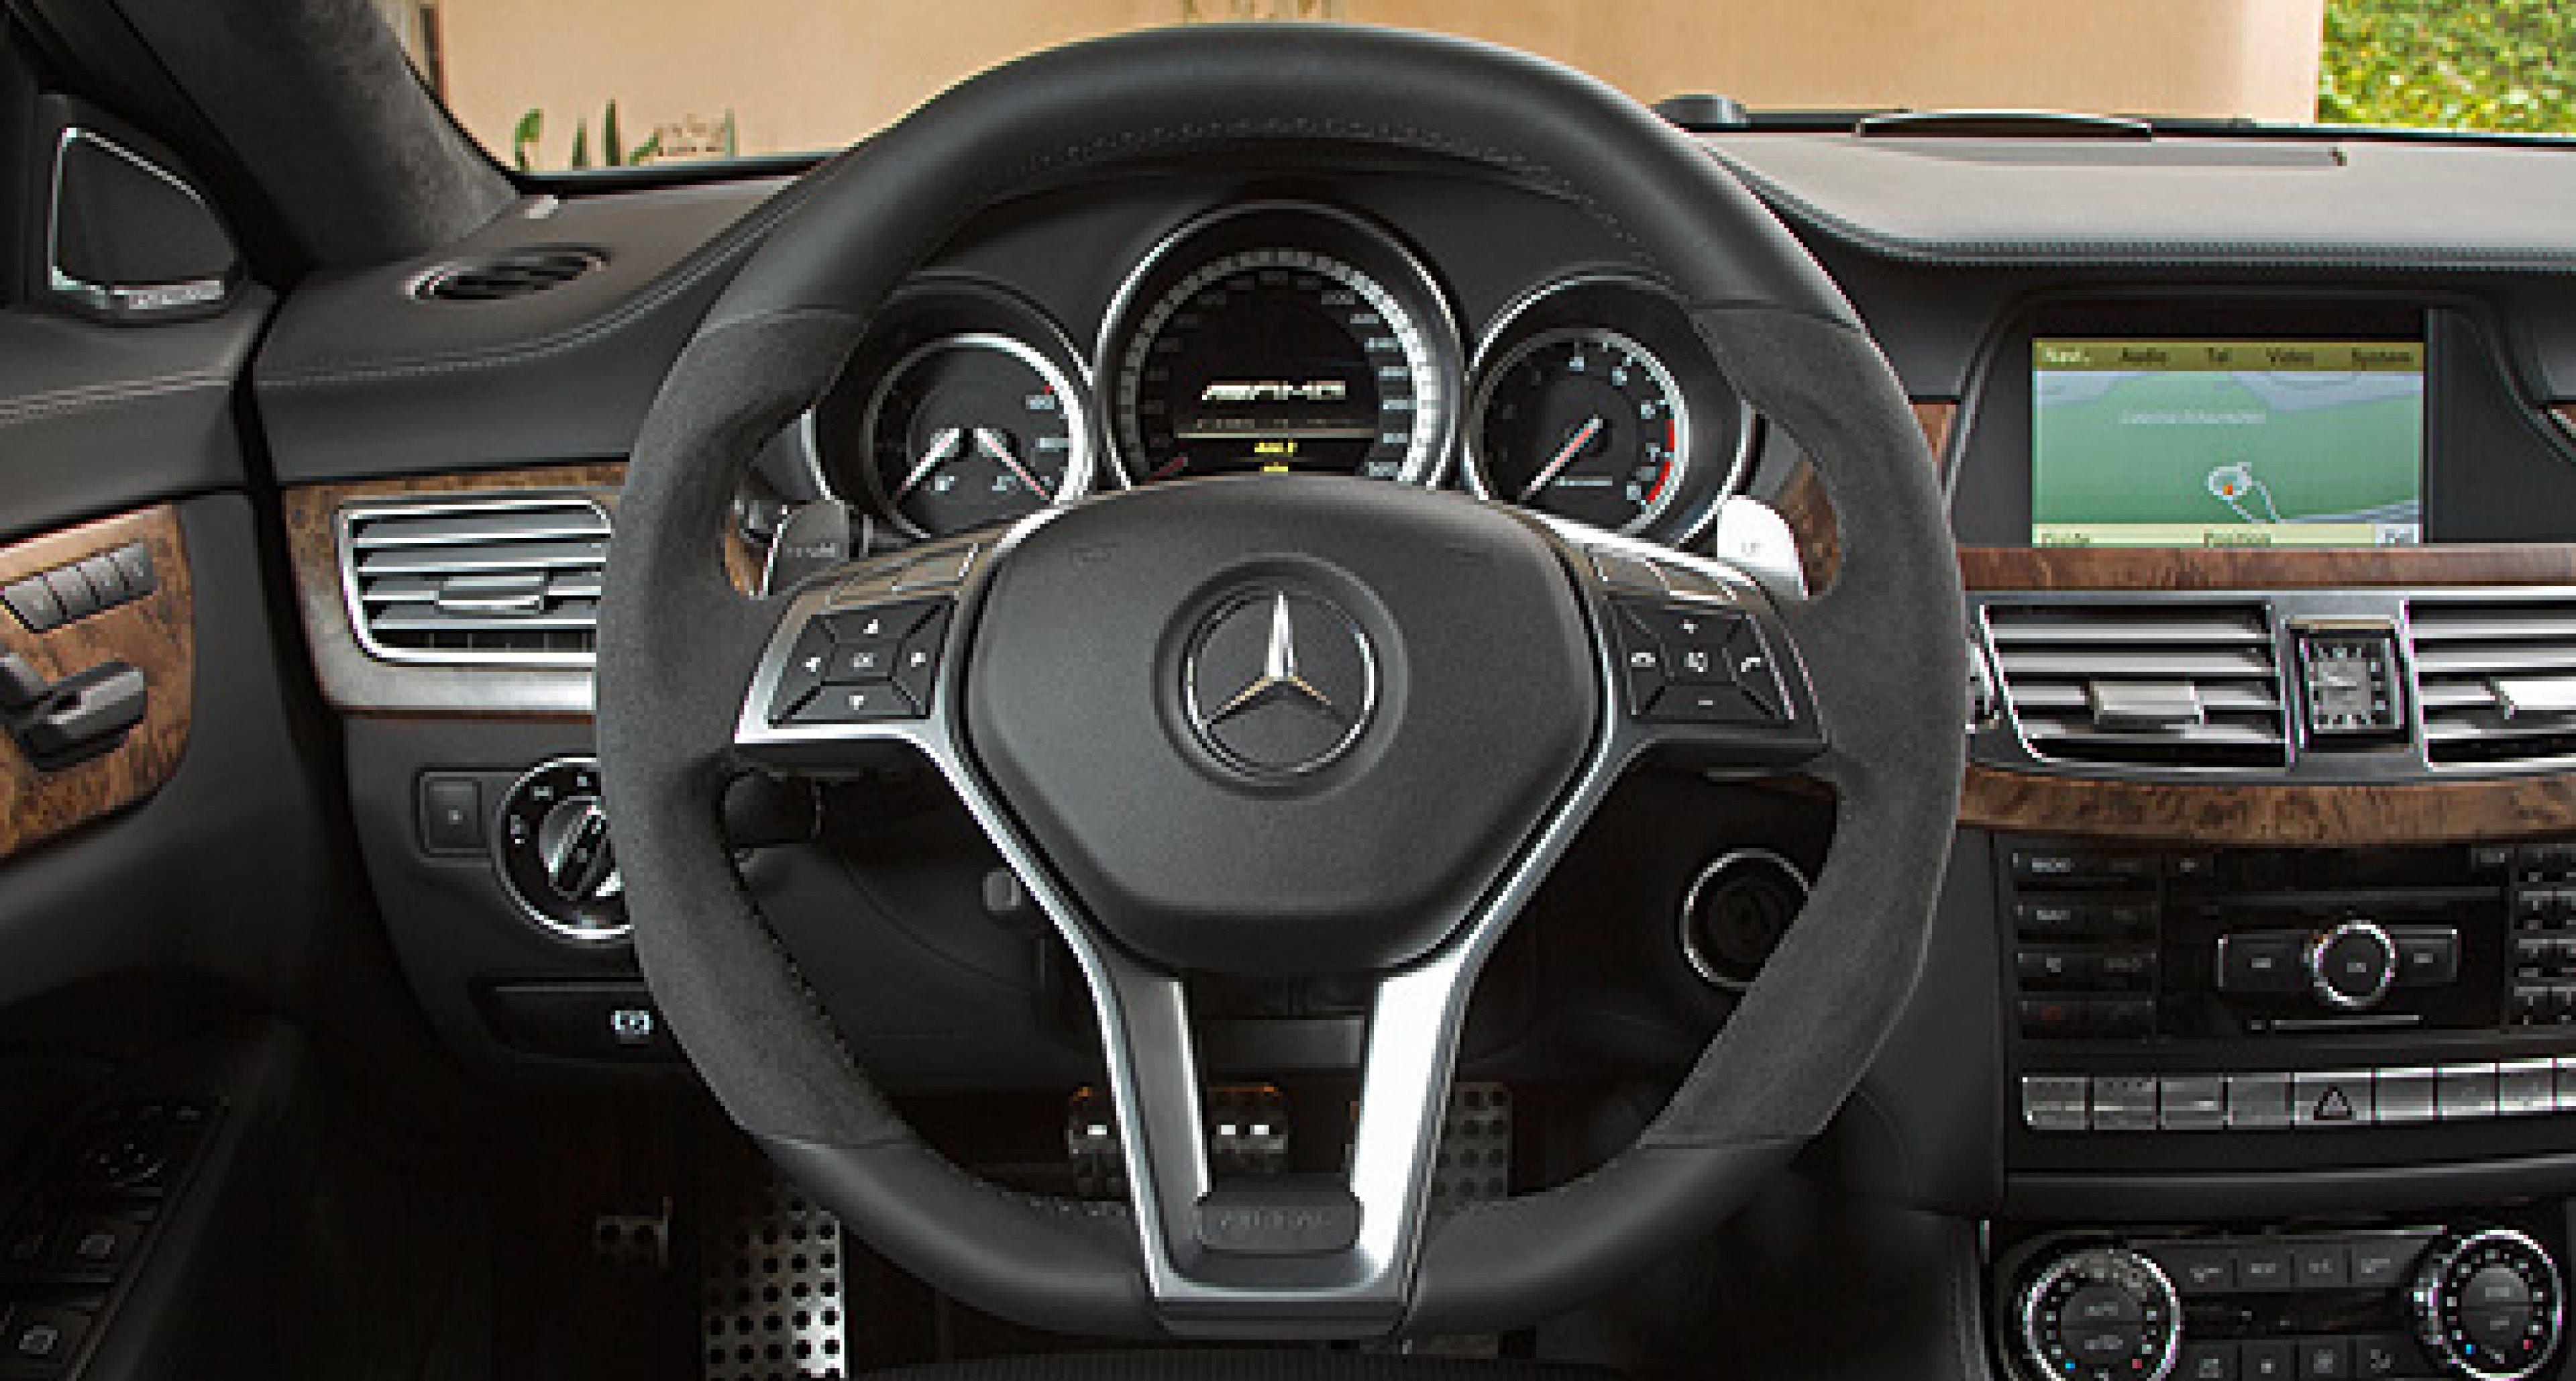 Mercedes-Benz CLS 63 AMG: Coupé unter Hochdruck